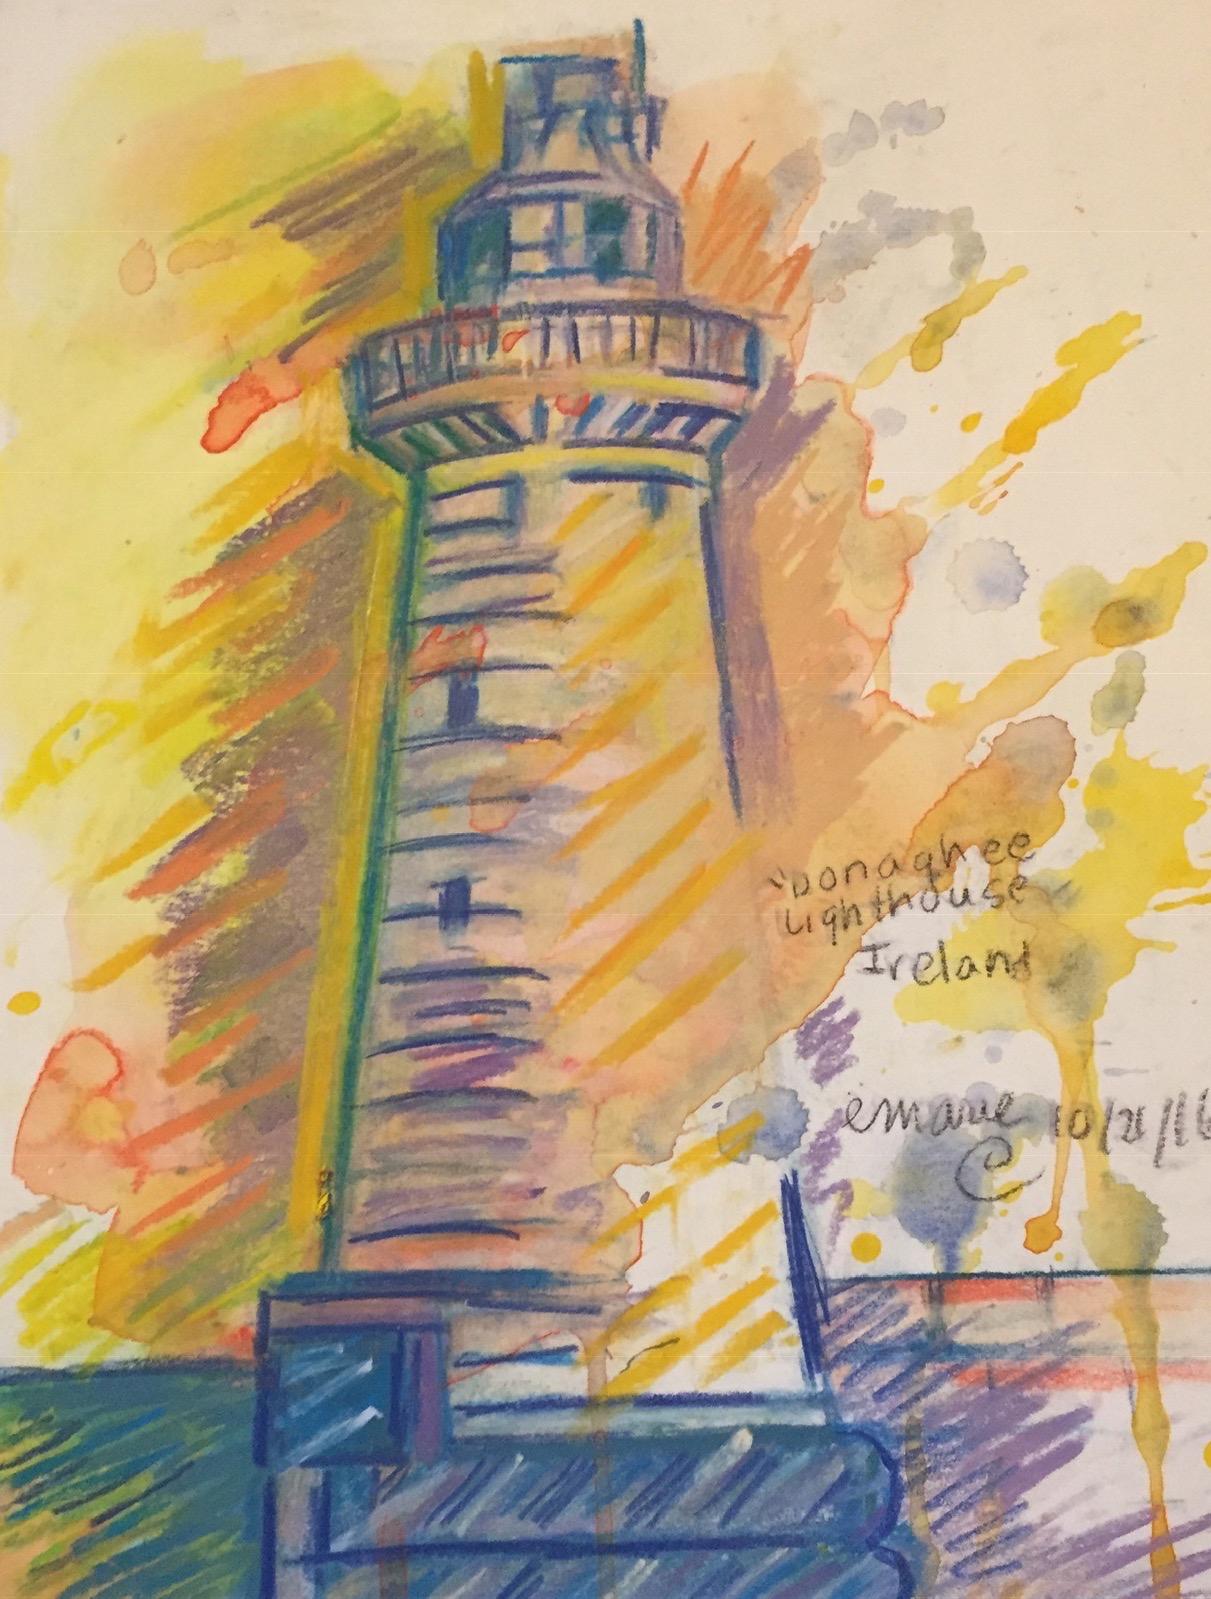 Donaghadee Lighthouse, Ireland